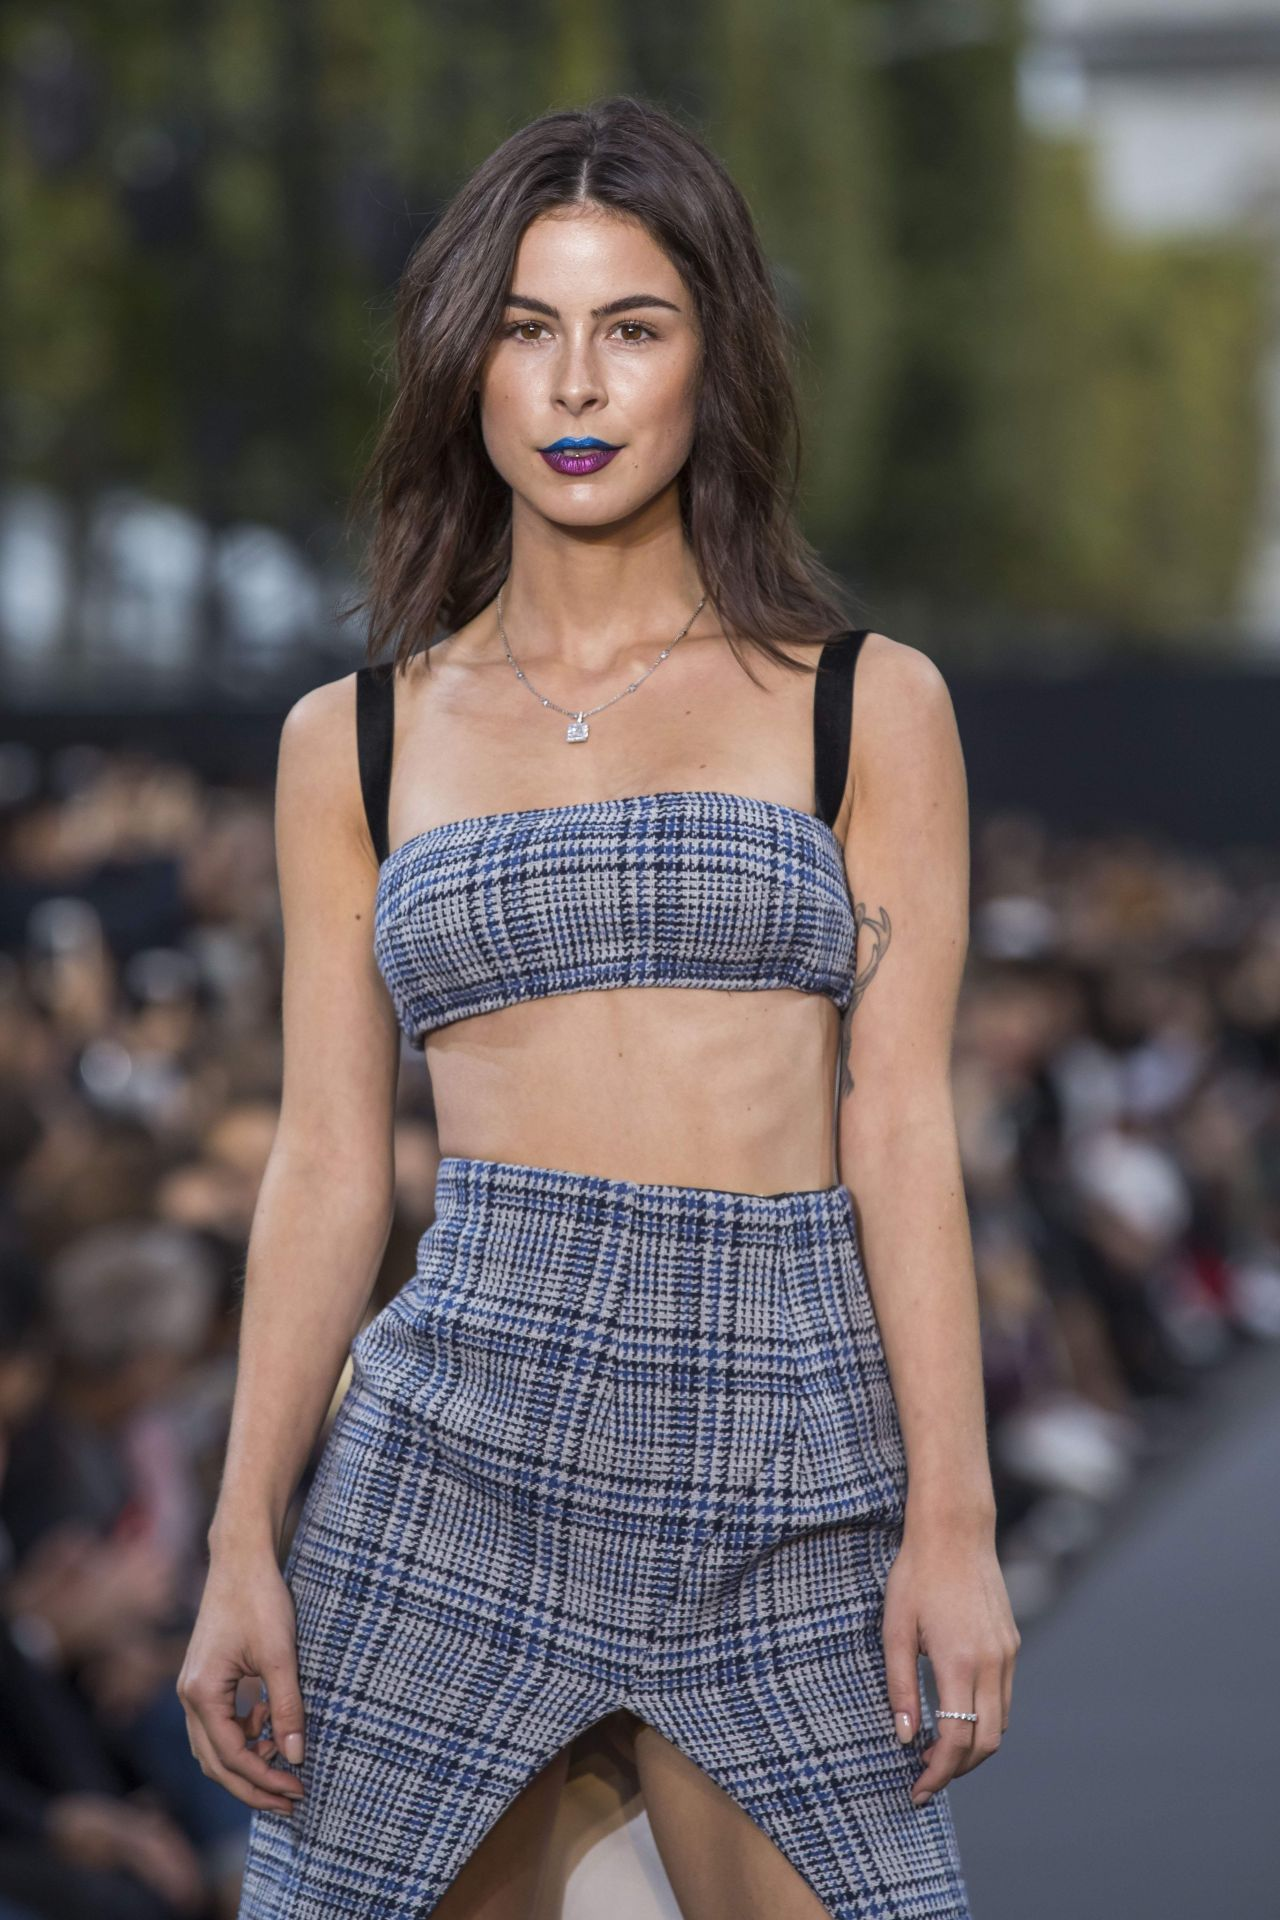 Lena Meyer Landrut Walks L U2019Oreal Show PFW In Paris 10 01